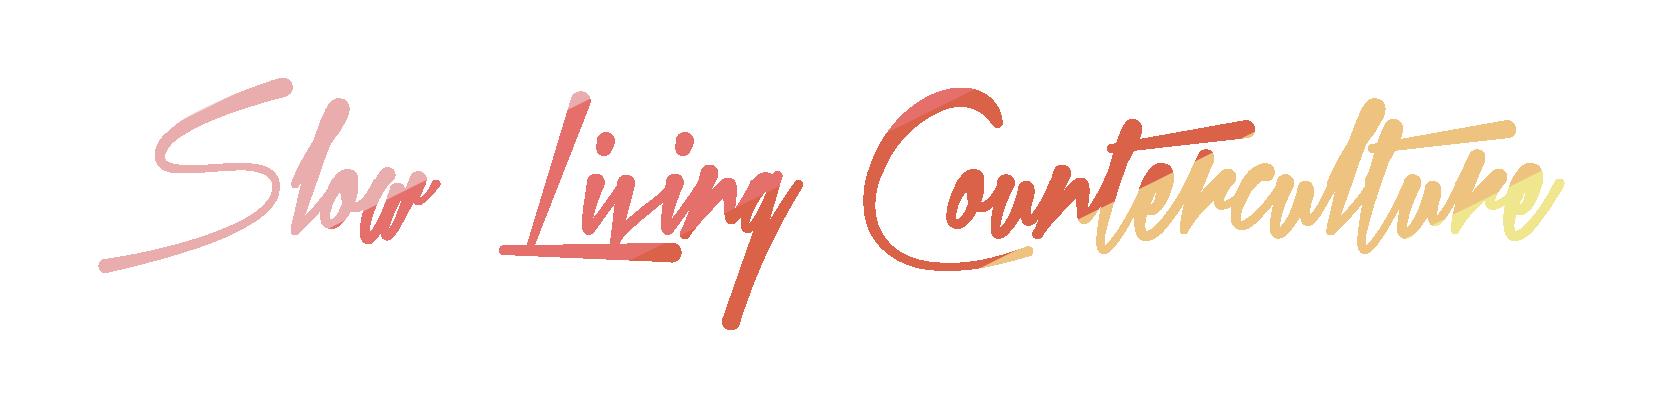 Slow Living Counterculture.png